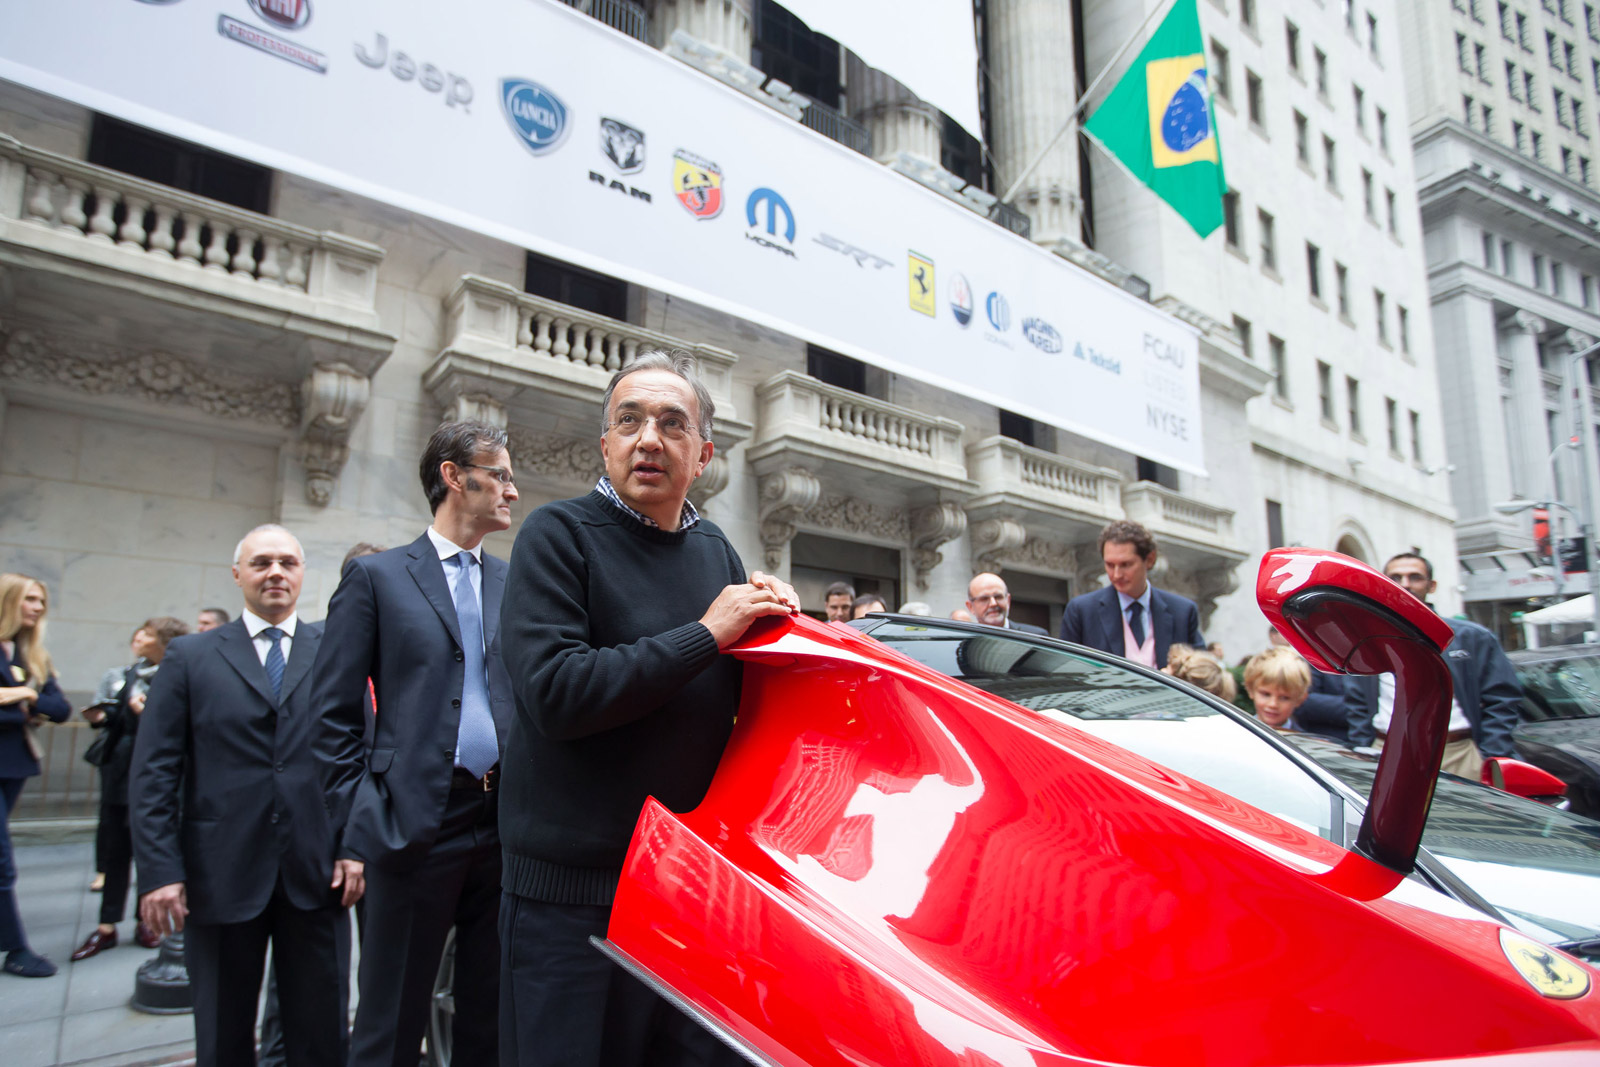 Fiat chrysler automobiles starts trading on new york stock exchange biocorpaavc